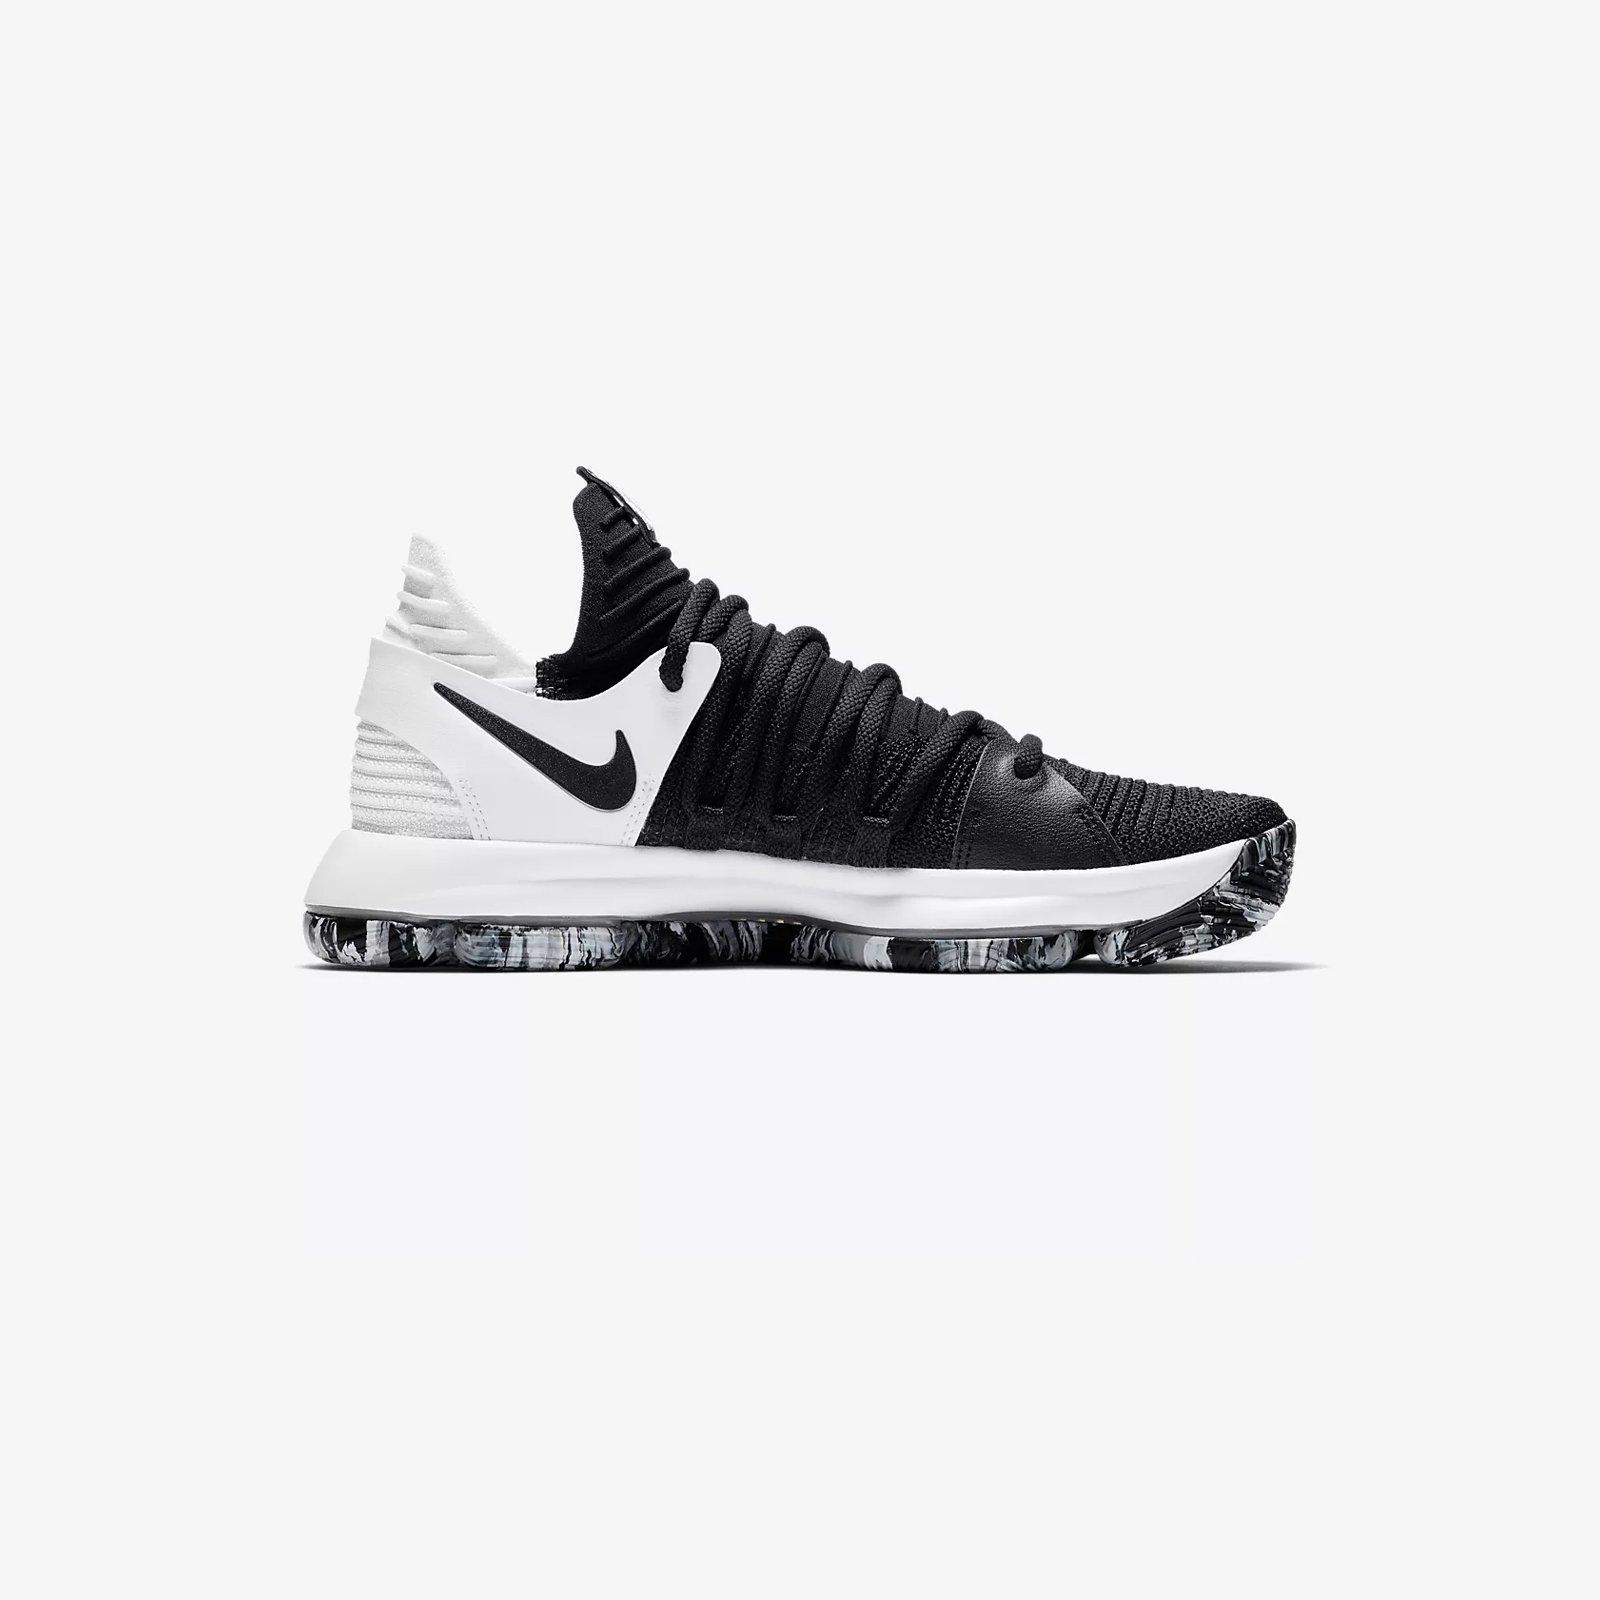 60e7c5e66f1d Nike Zoom KD10 - 897815-008 - Sneakersnstuff